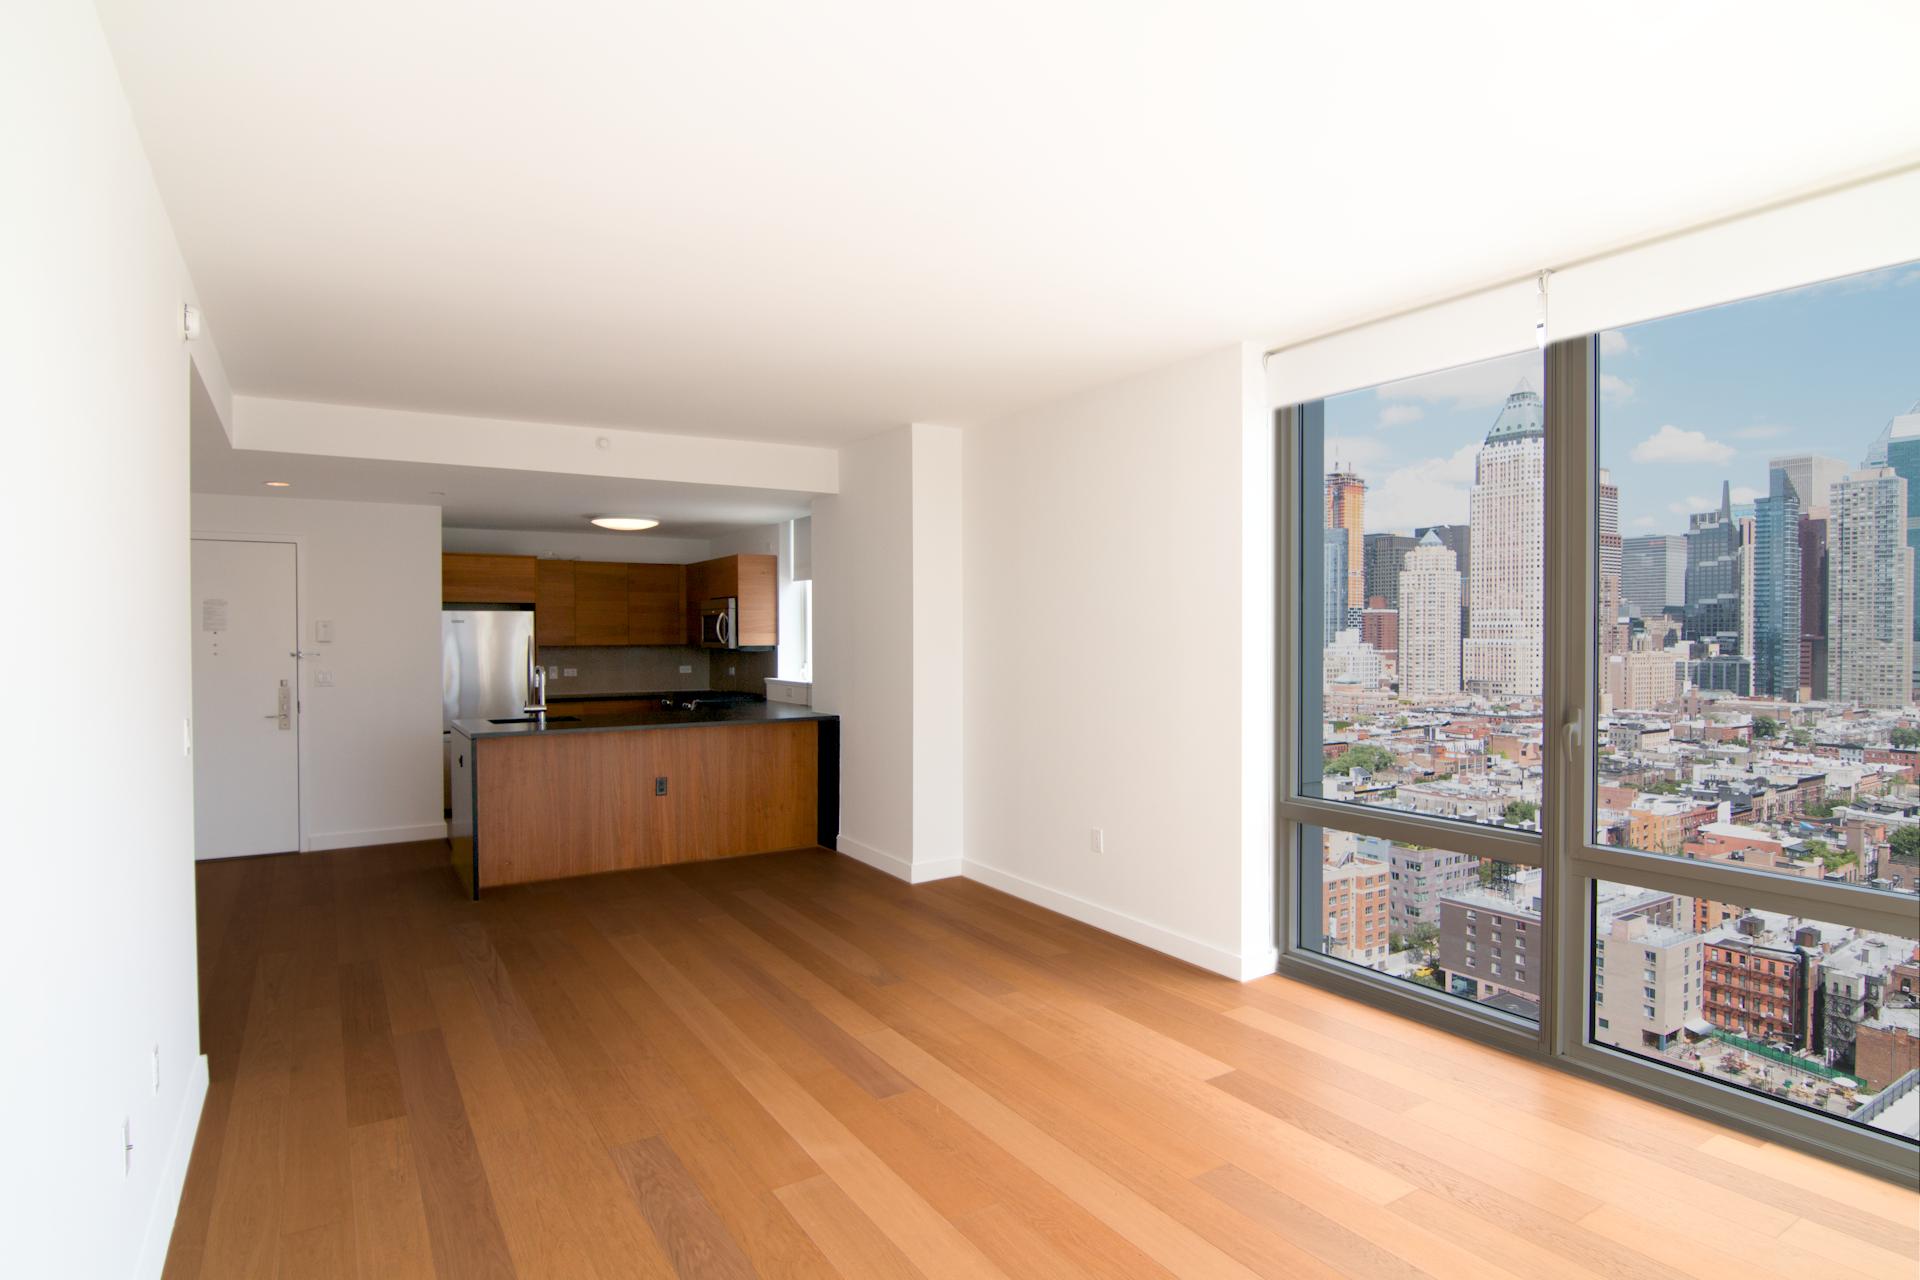 204 Pet Friendly Apartments for Rent in North Bergen, NJ - Zumper